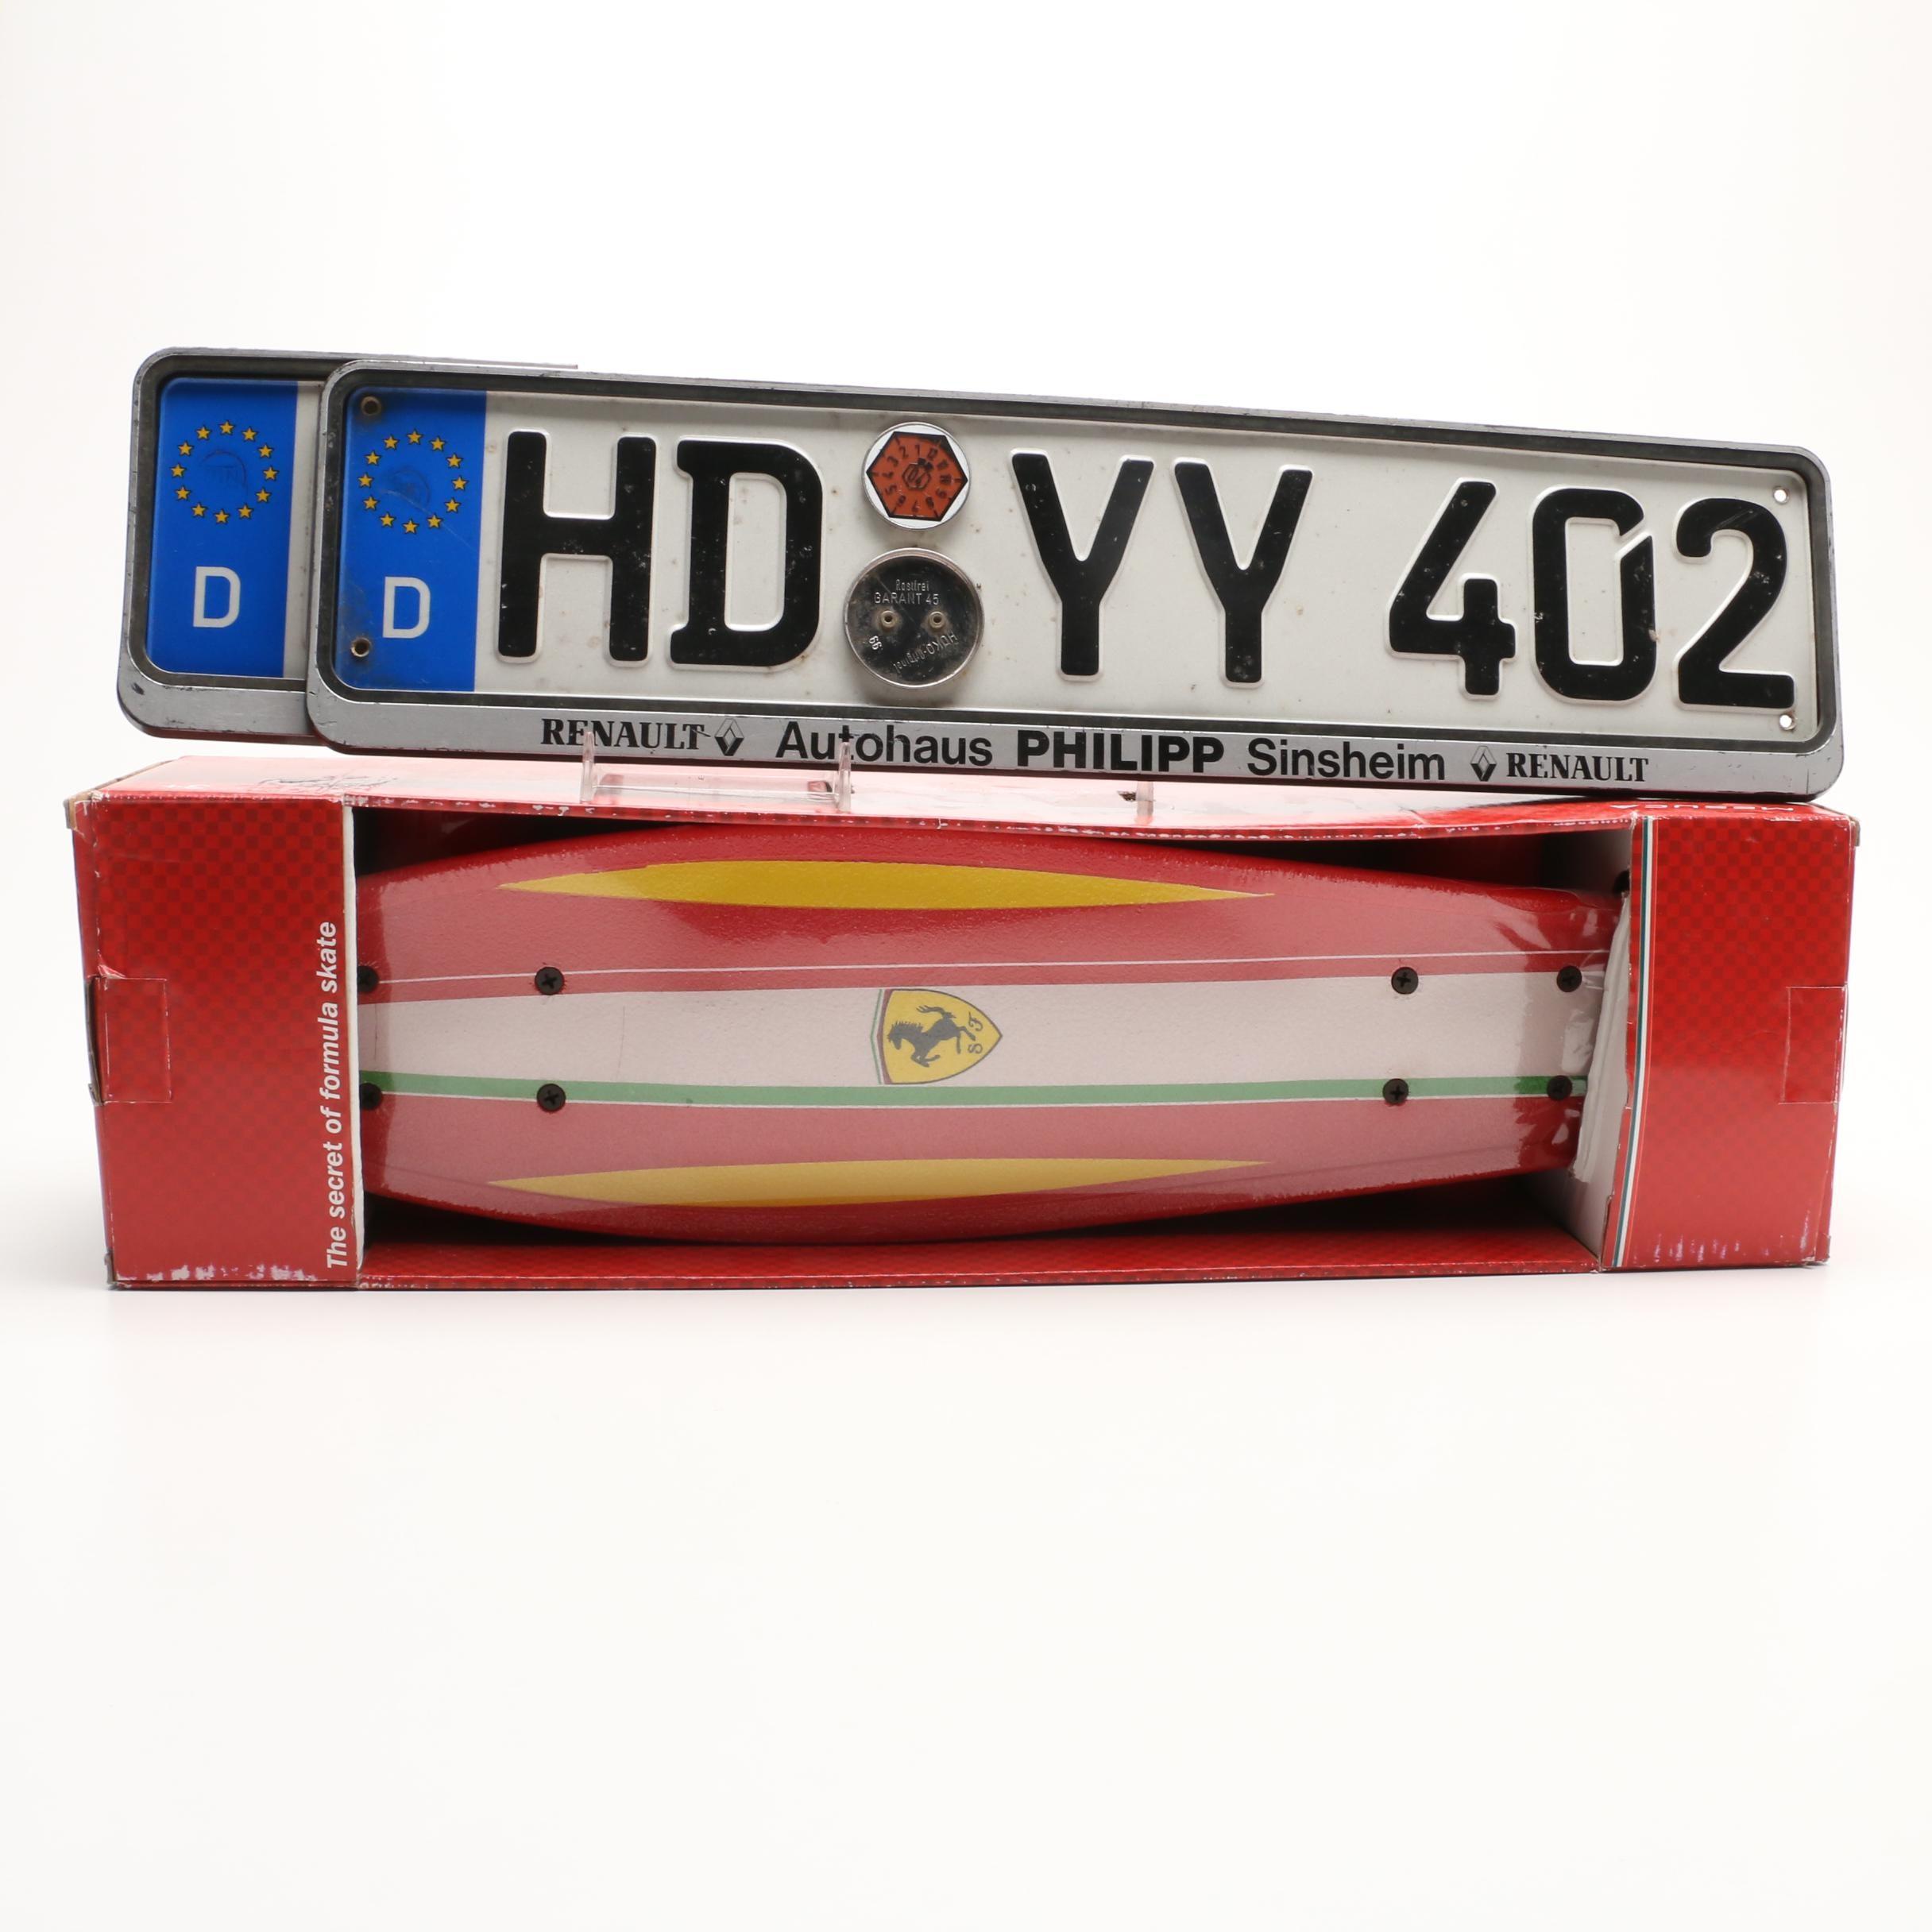 Pair of European Union Automotive Liscence Plates and Mecusa Ferrari Skateboard